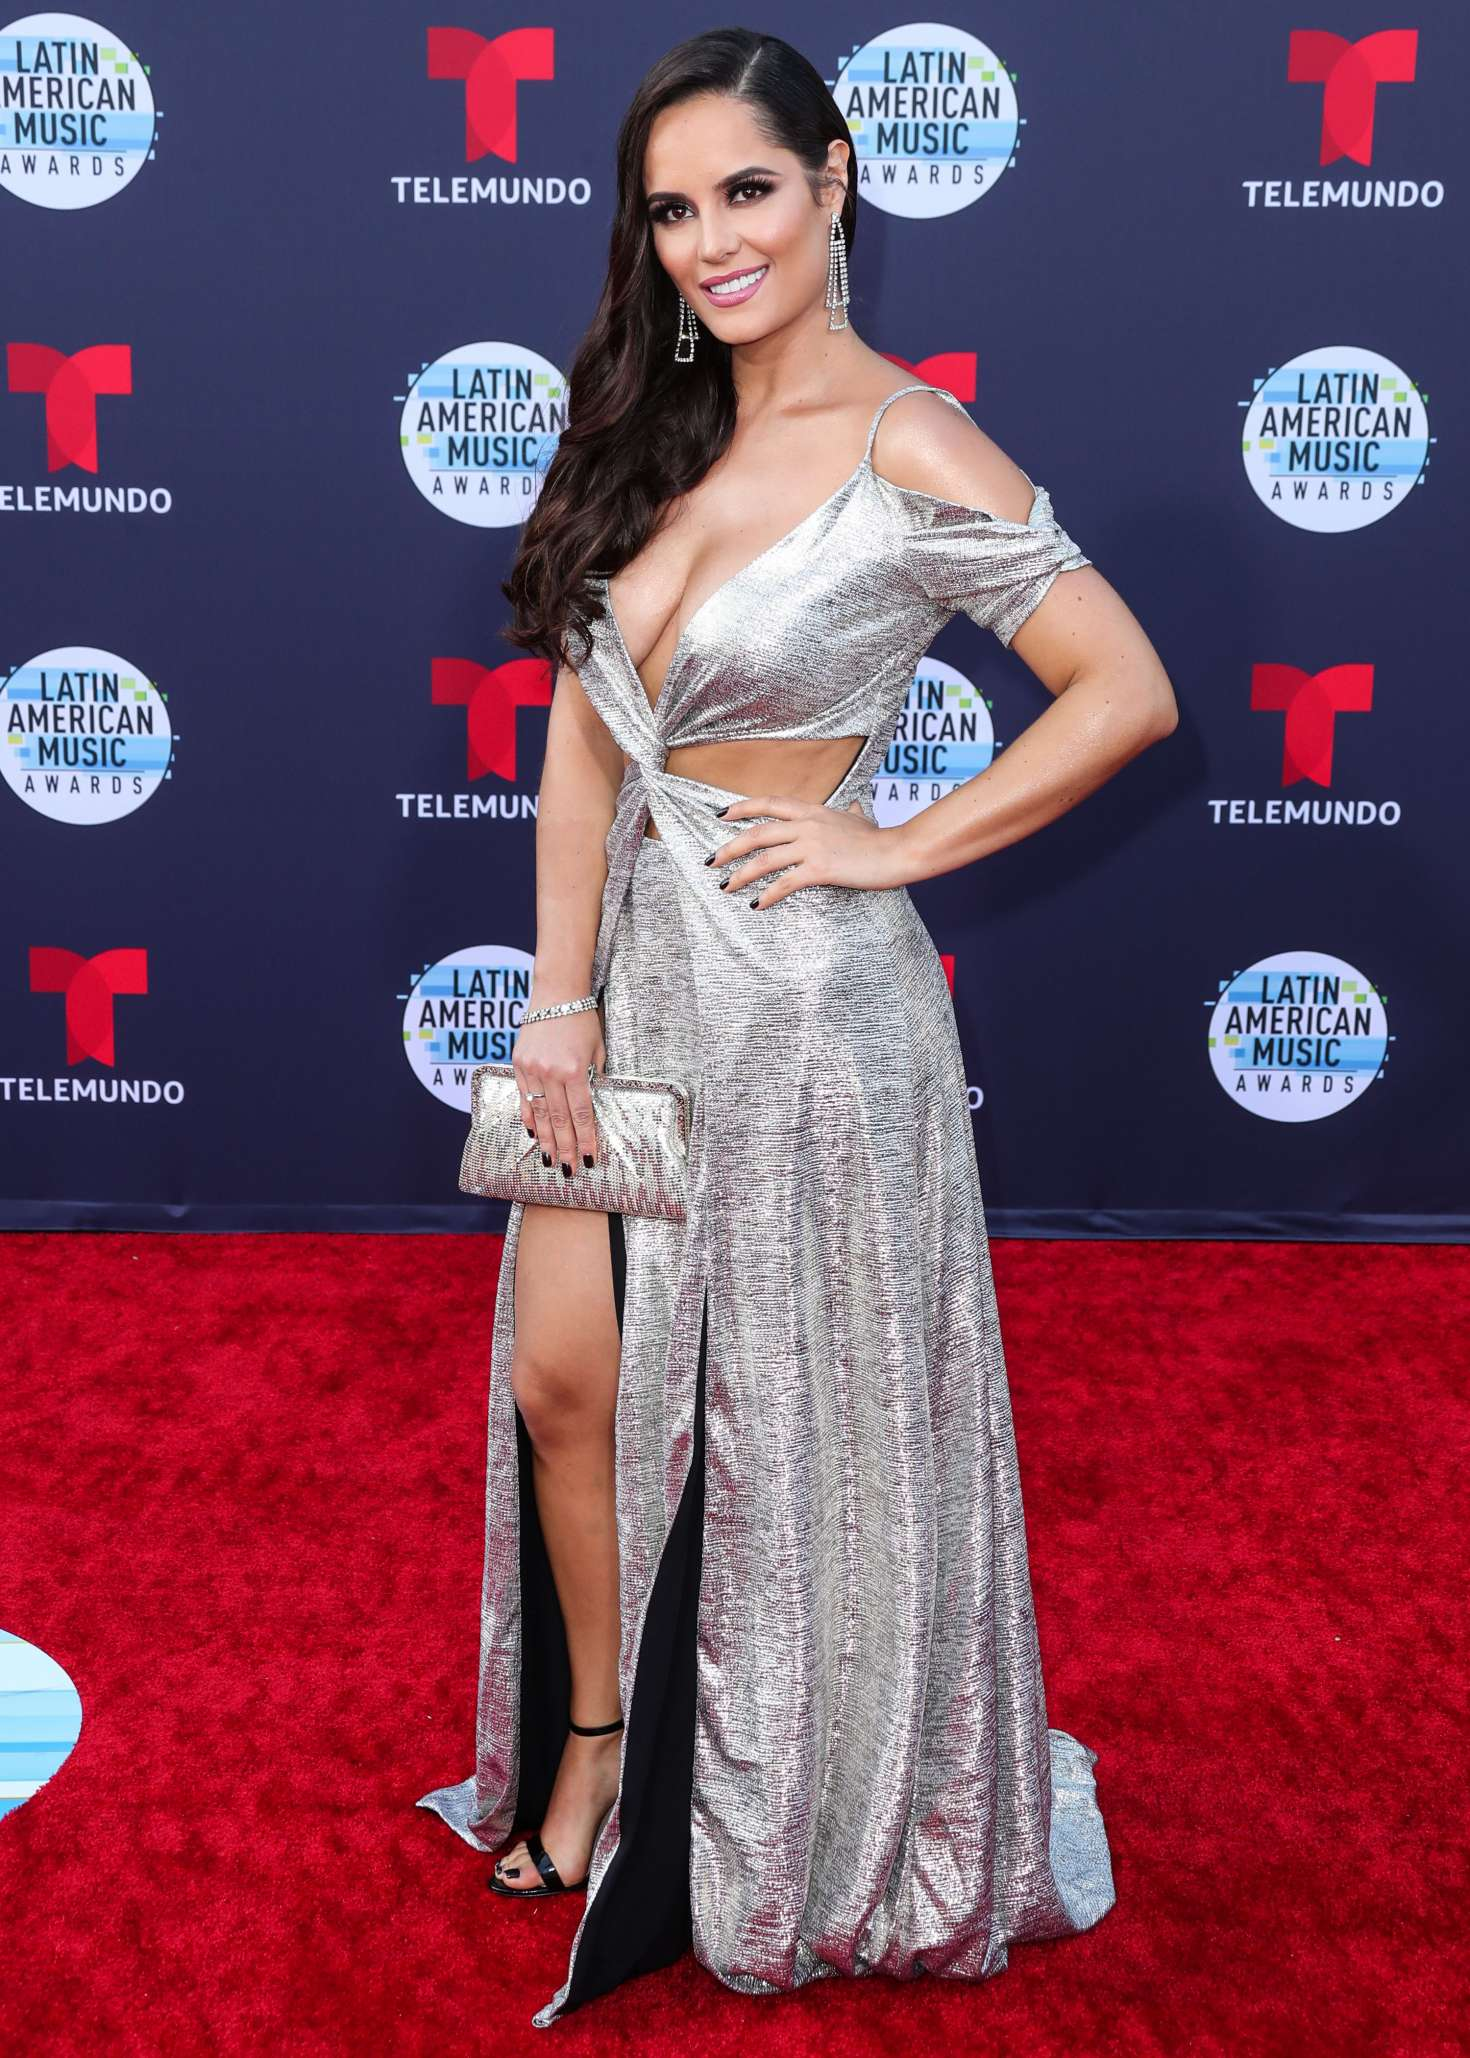 Ana Lucia Dominguez 2018 : Ana Lucia Dominguez: 2018 Latin American Music Awards -09